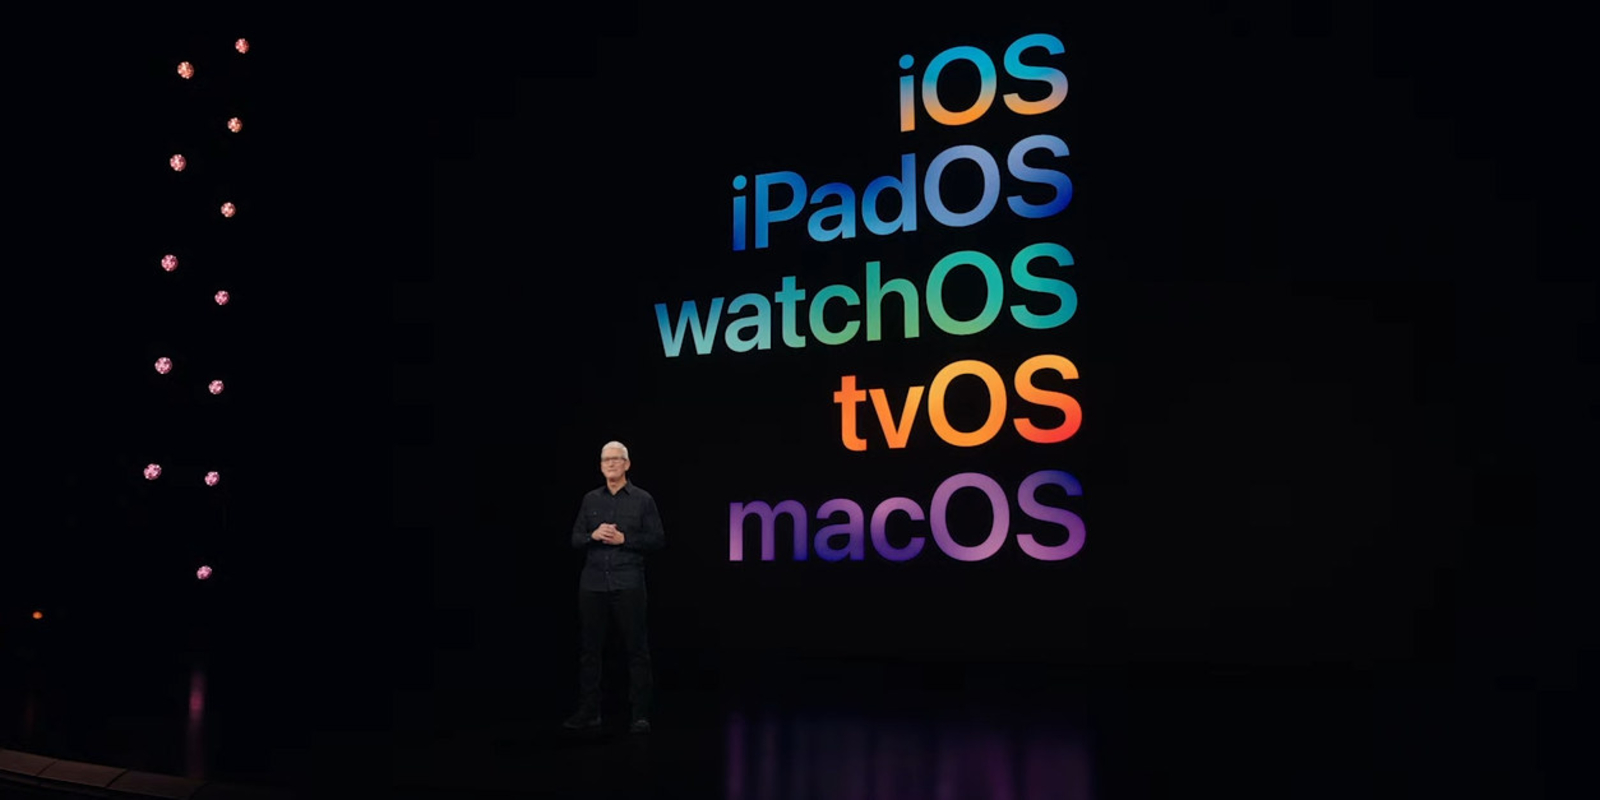 Live-Ticker Apple-Keynote WWDC 2021 mit iOS 15, macOS 12 & Co.